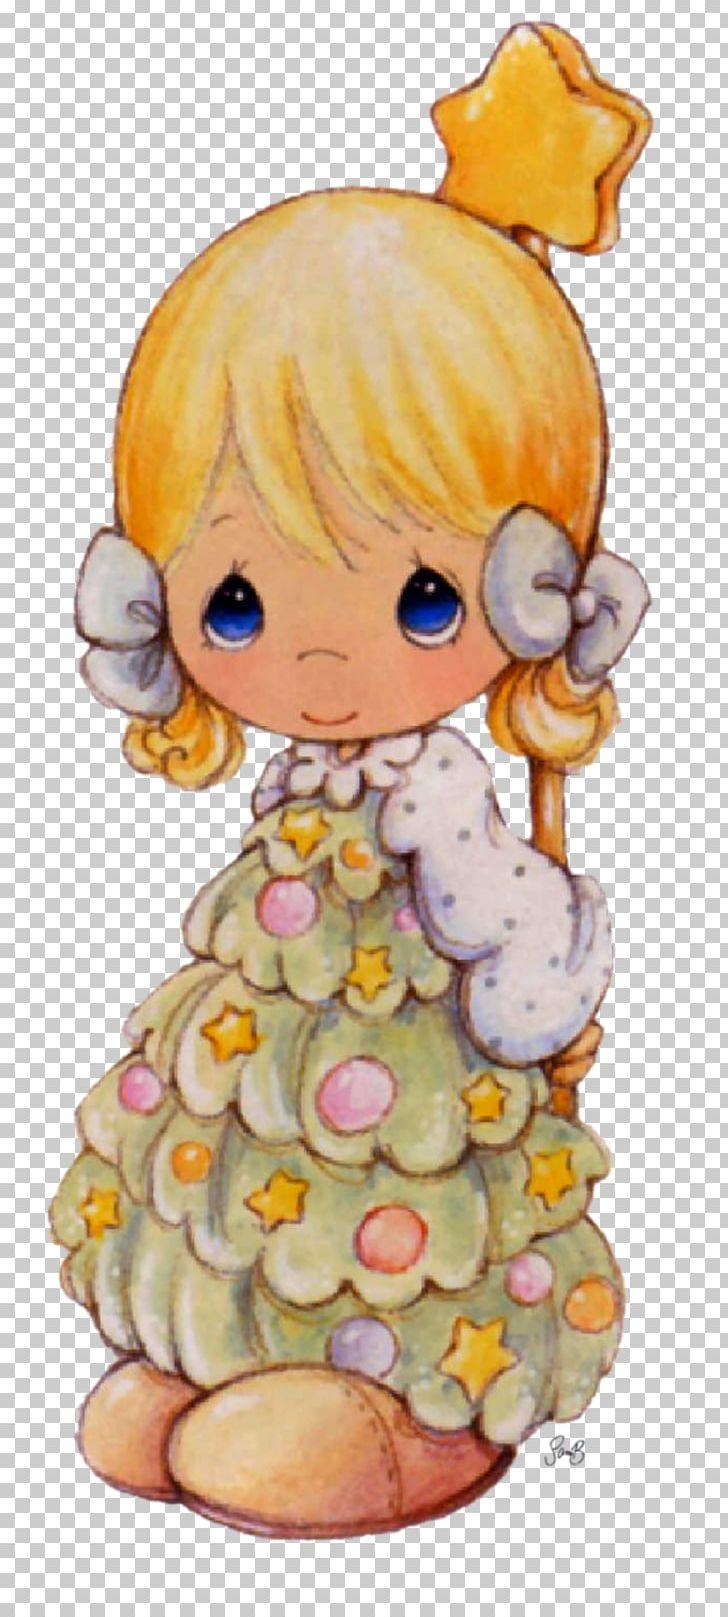 Precious Moments Christmas Precious Moments Png Clipart Art Child Christmas Christmas Card Christmas Tree Free Png